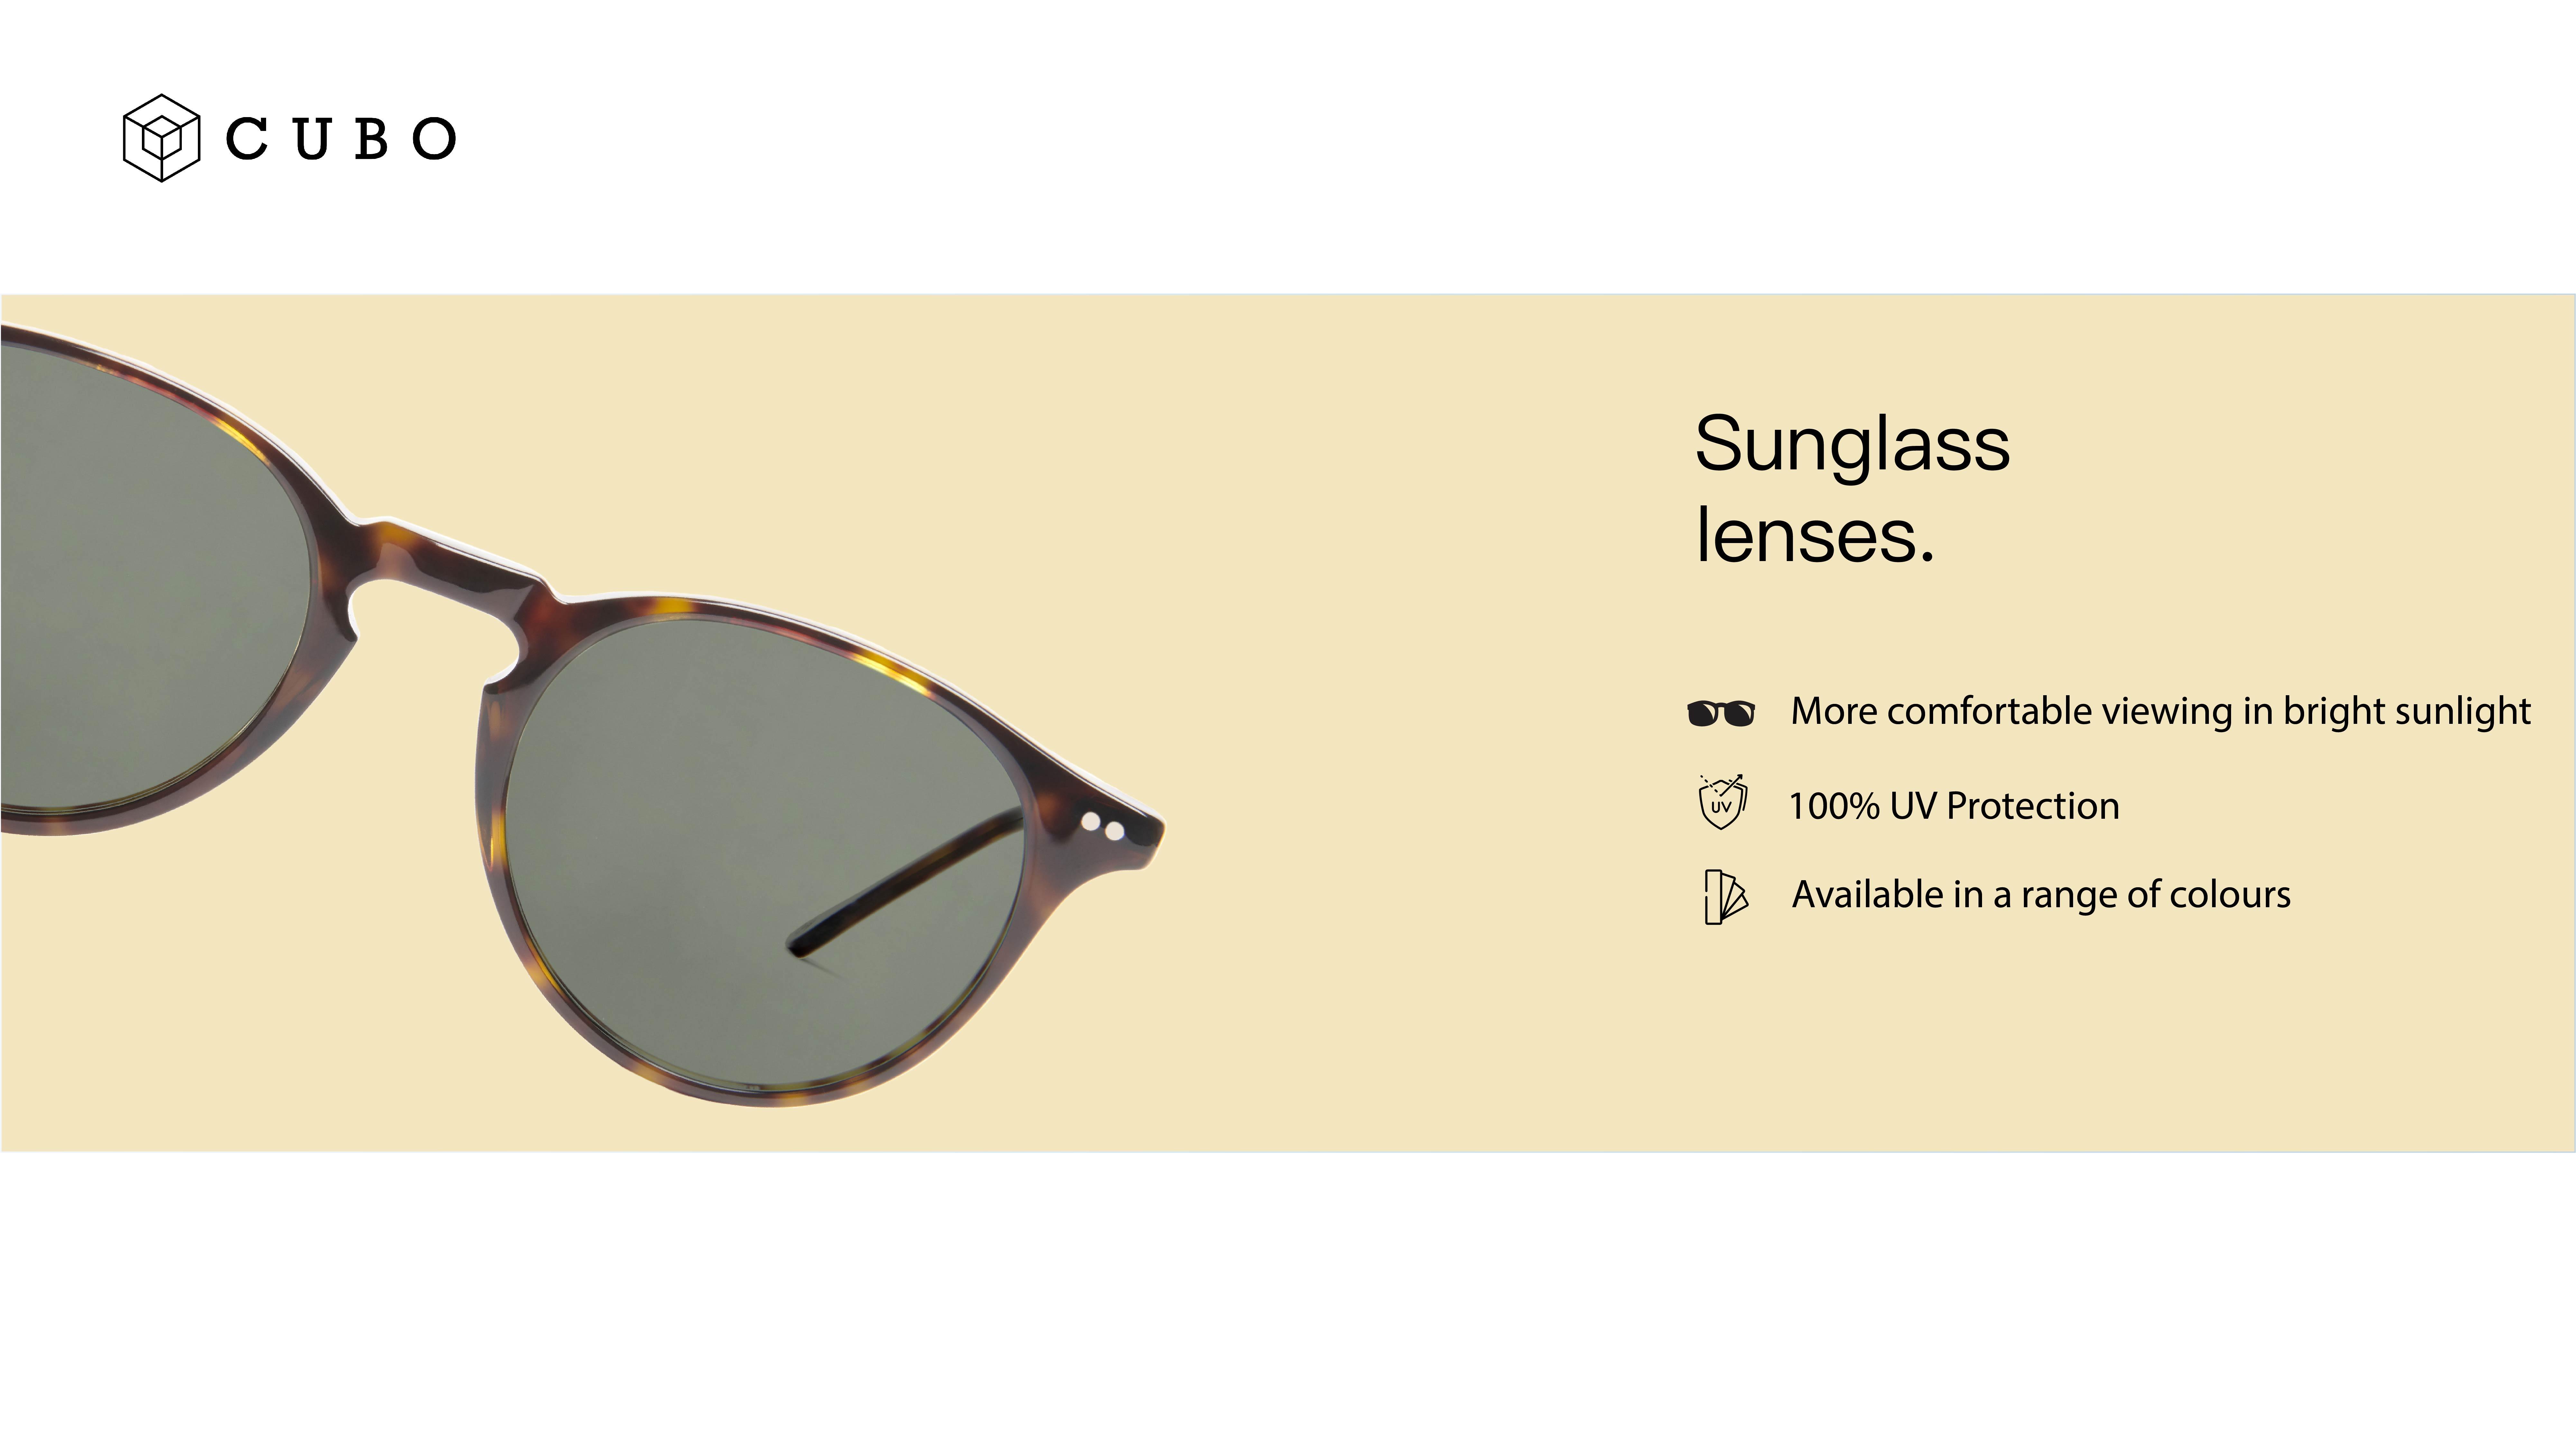 sunglasses-lenses-page.jpg